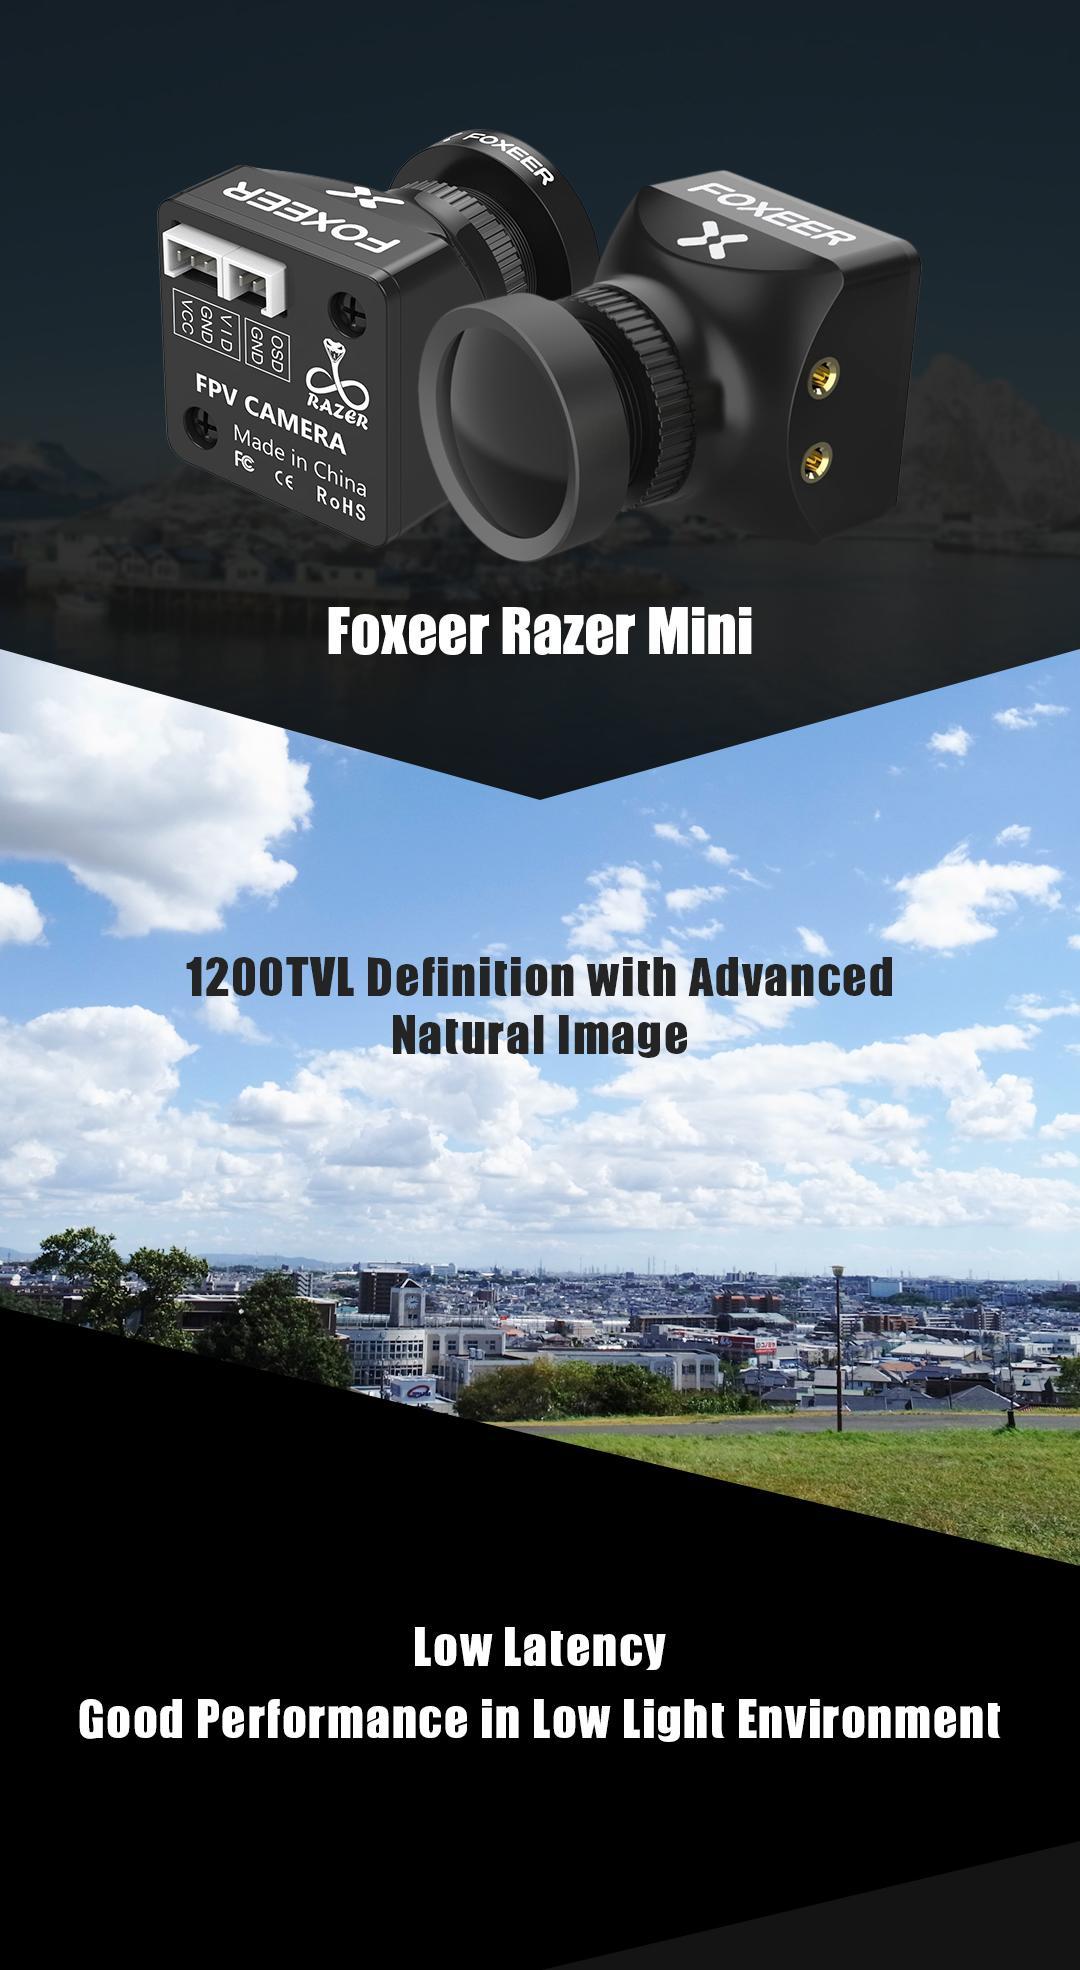 foxeer razer specs and low latency